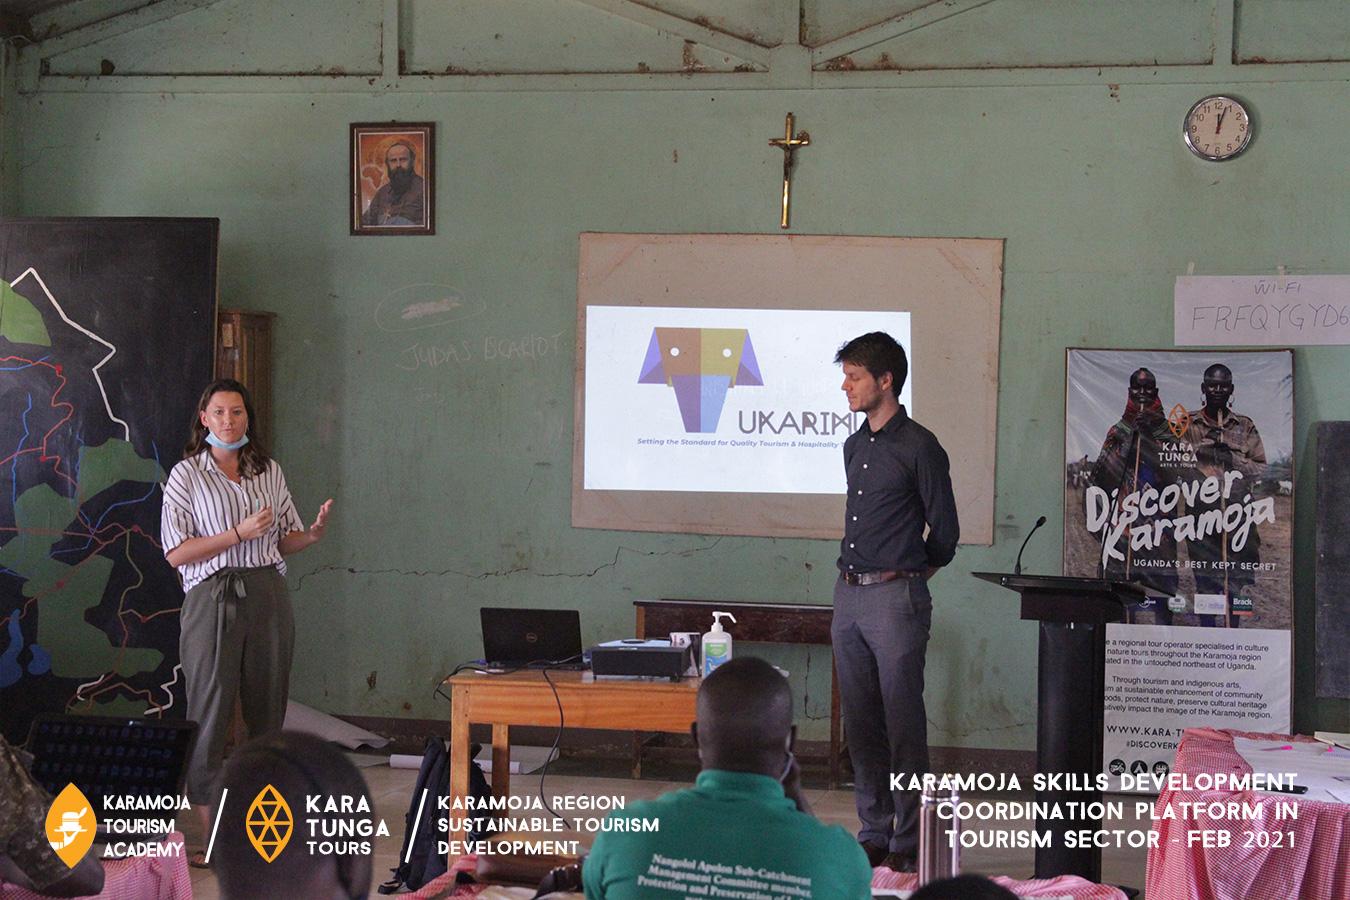 kara-tunga-karamoja-tourism-academy-stakeholder-meeting-2021-17